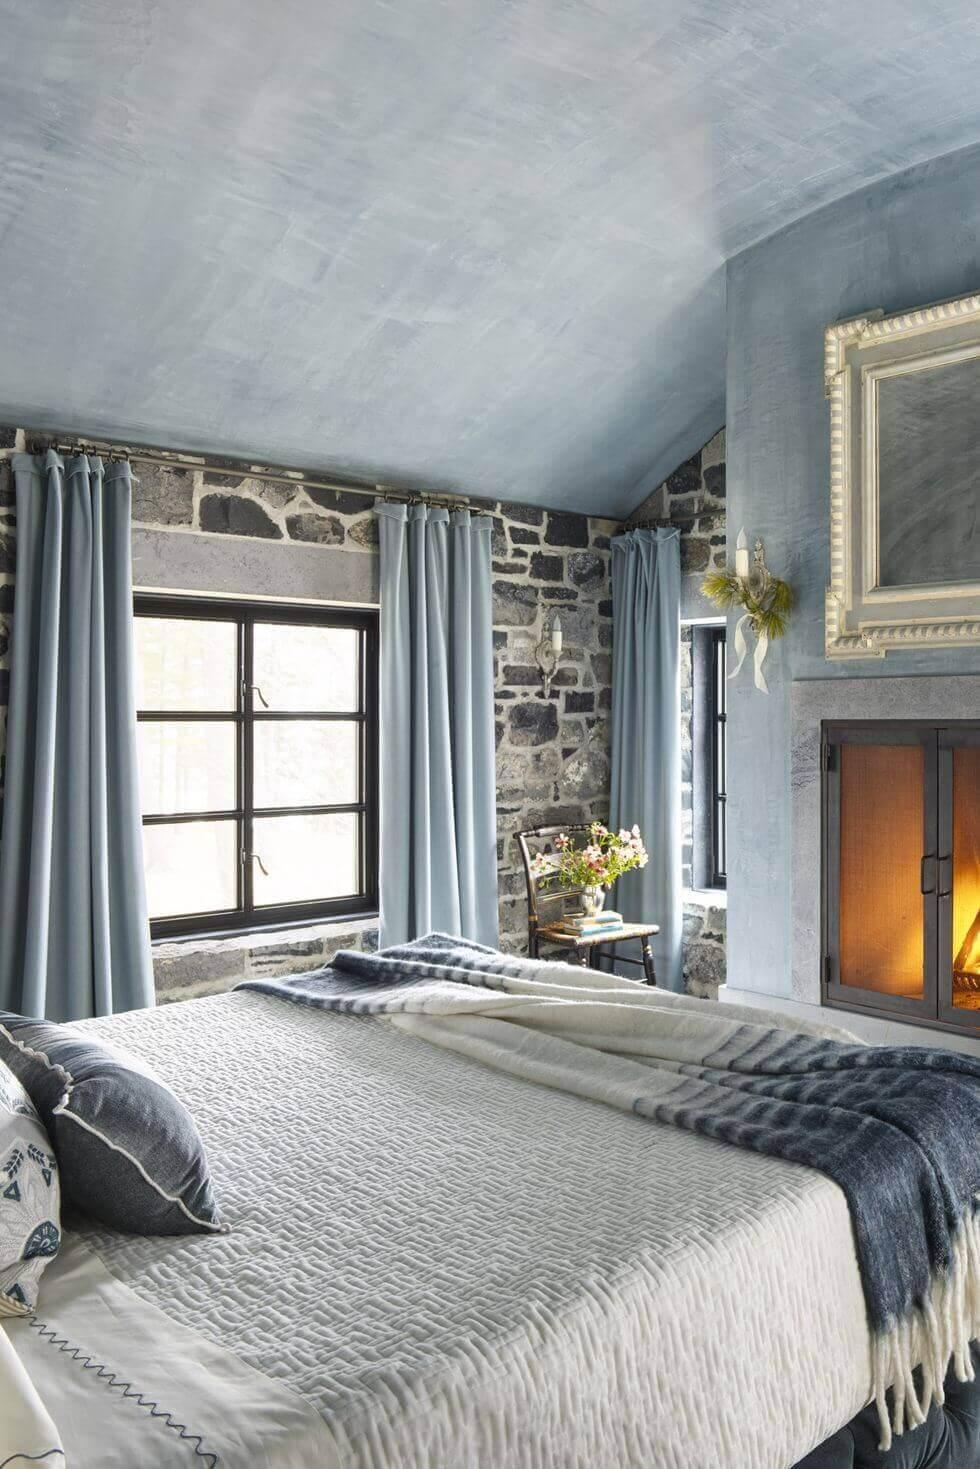 Master Bedroom Ideas 4 Make It Texture-Rich